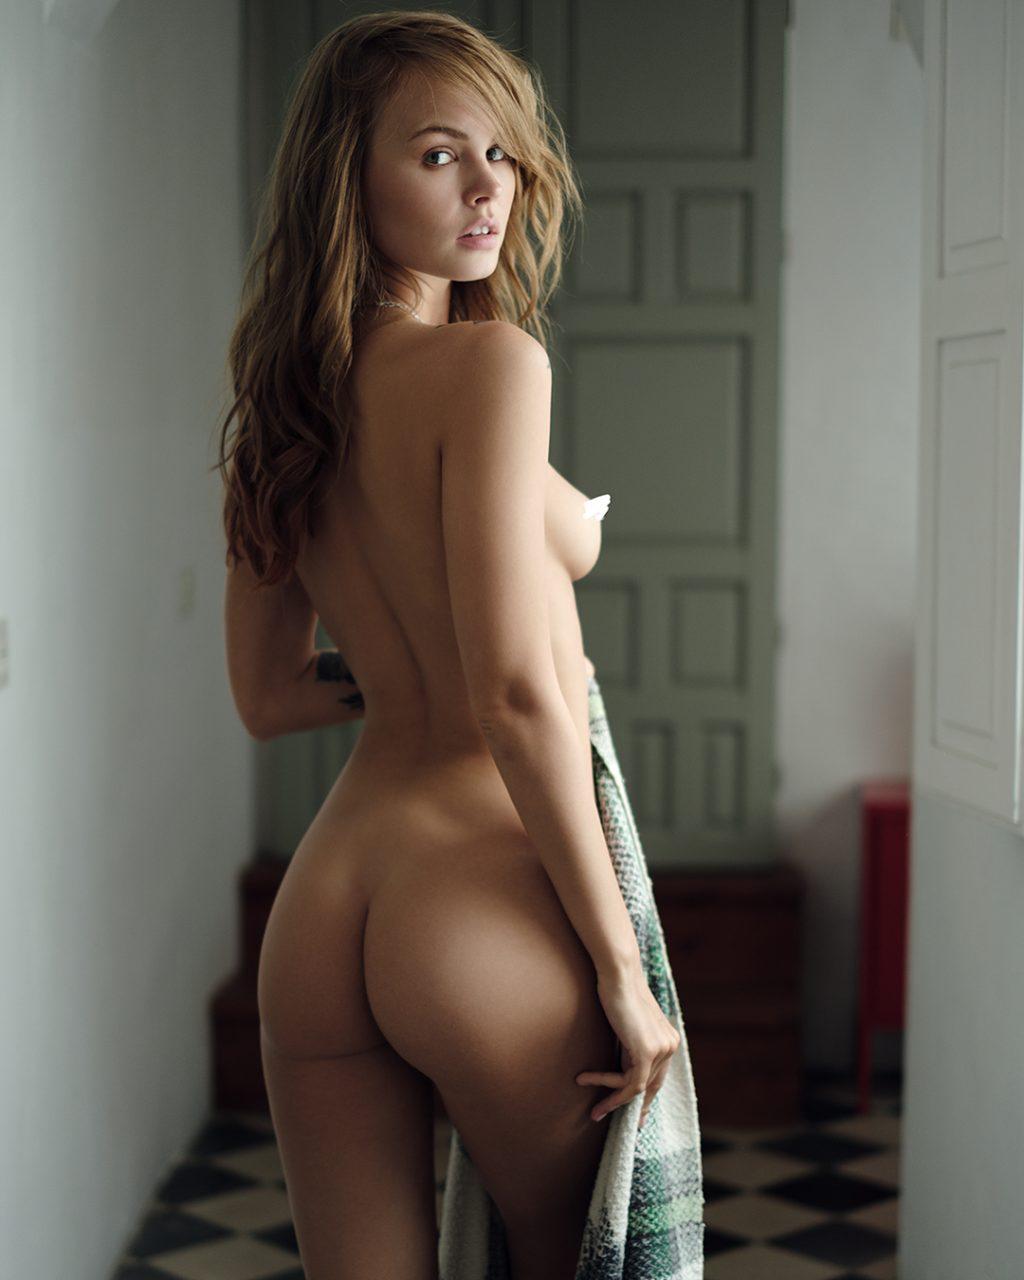 Anastasiya Nude anastasiya scheglova topless (5 photos) – ( ͡° ͜ʖ ͡°) |the